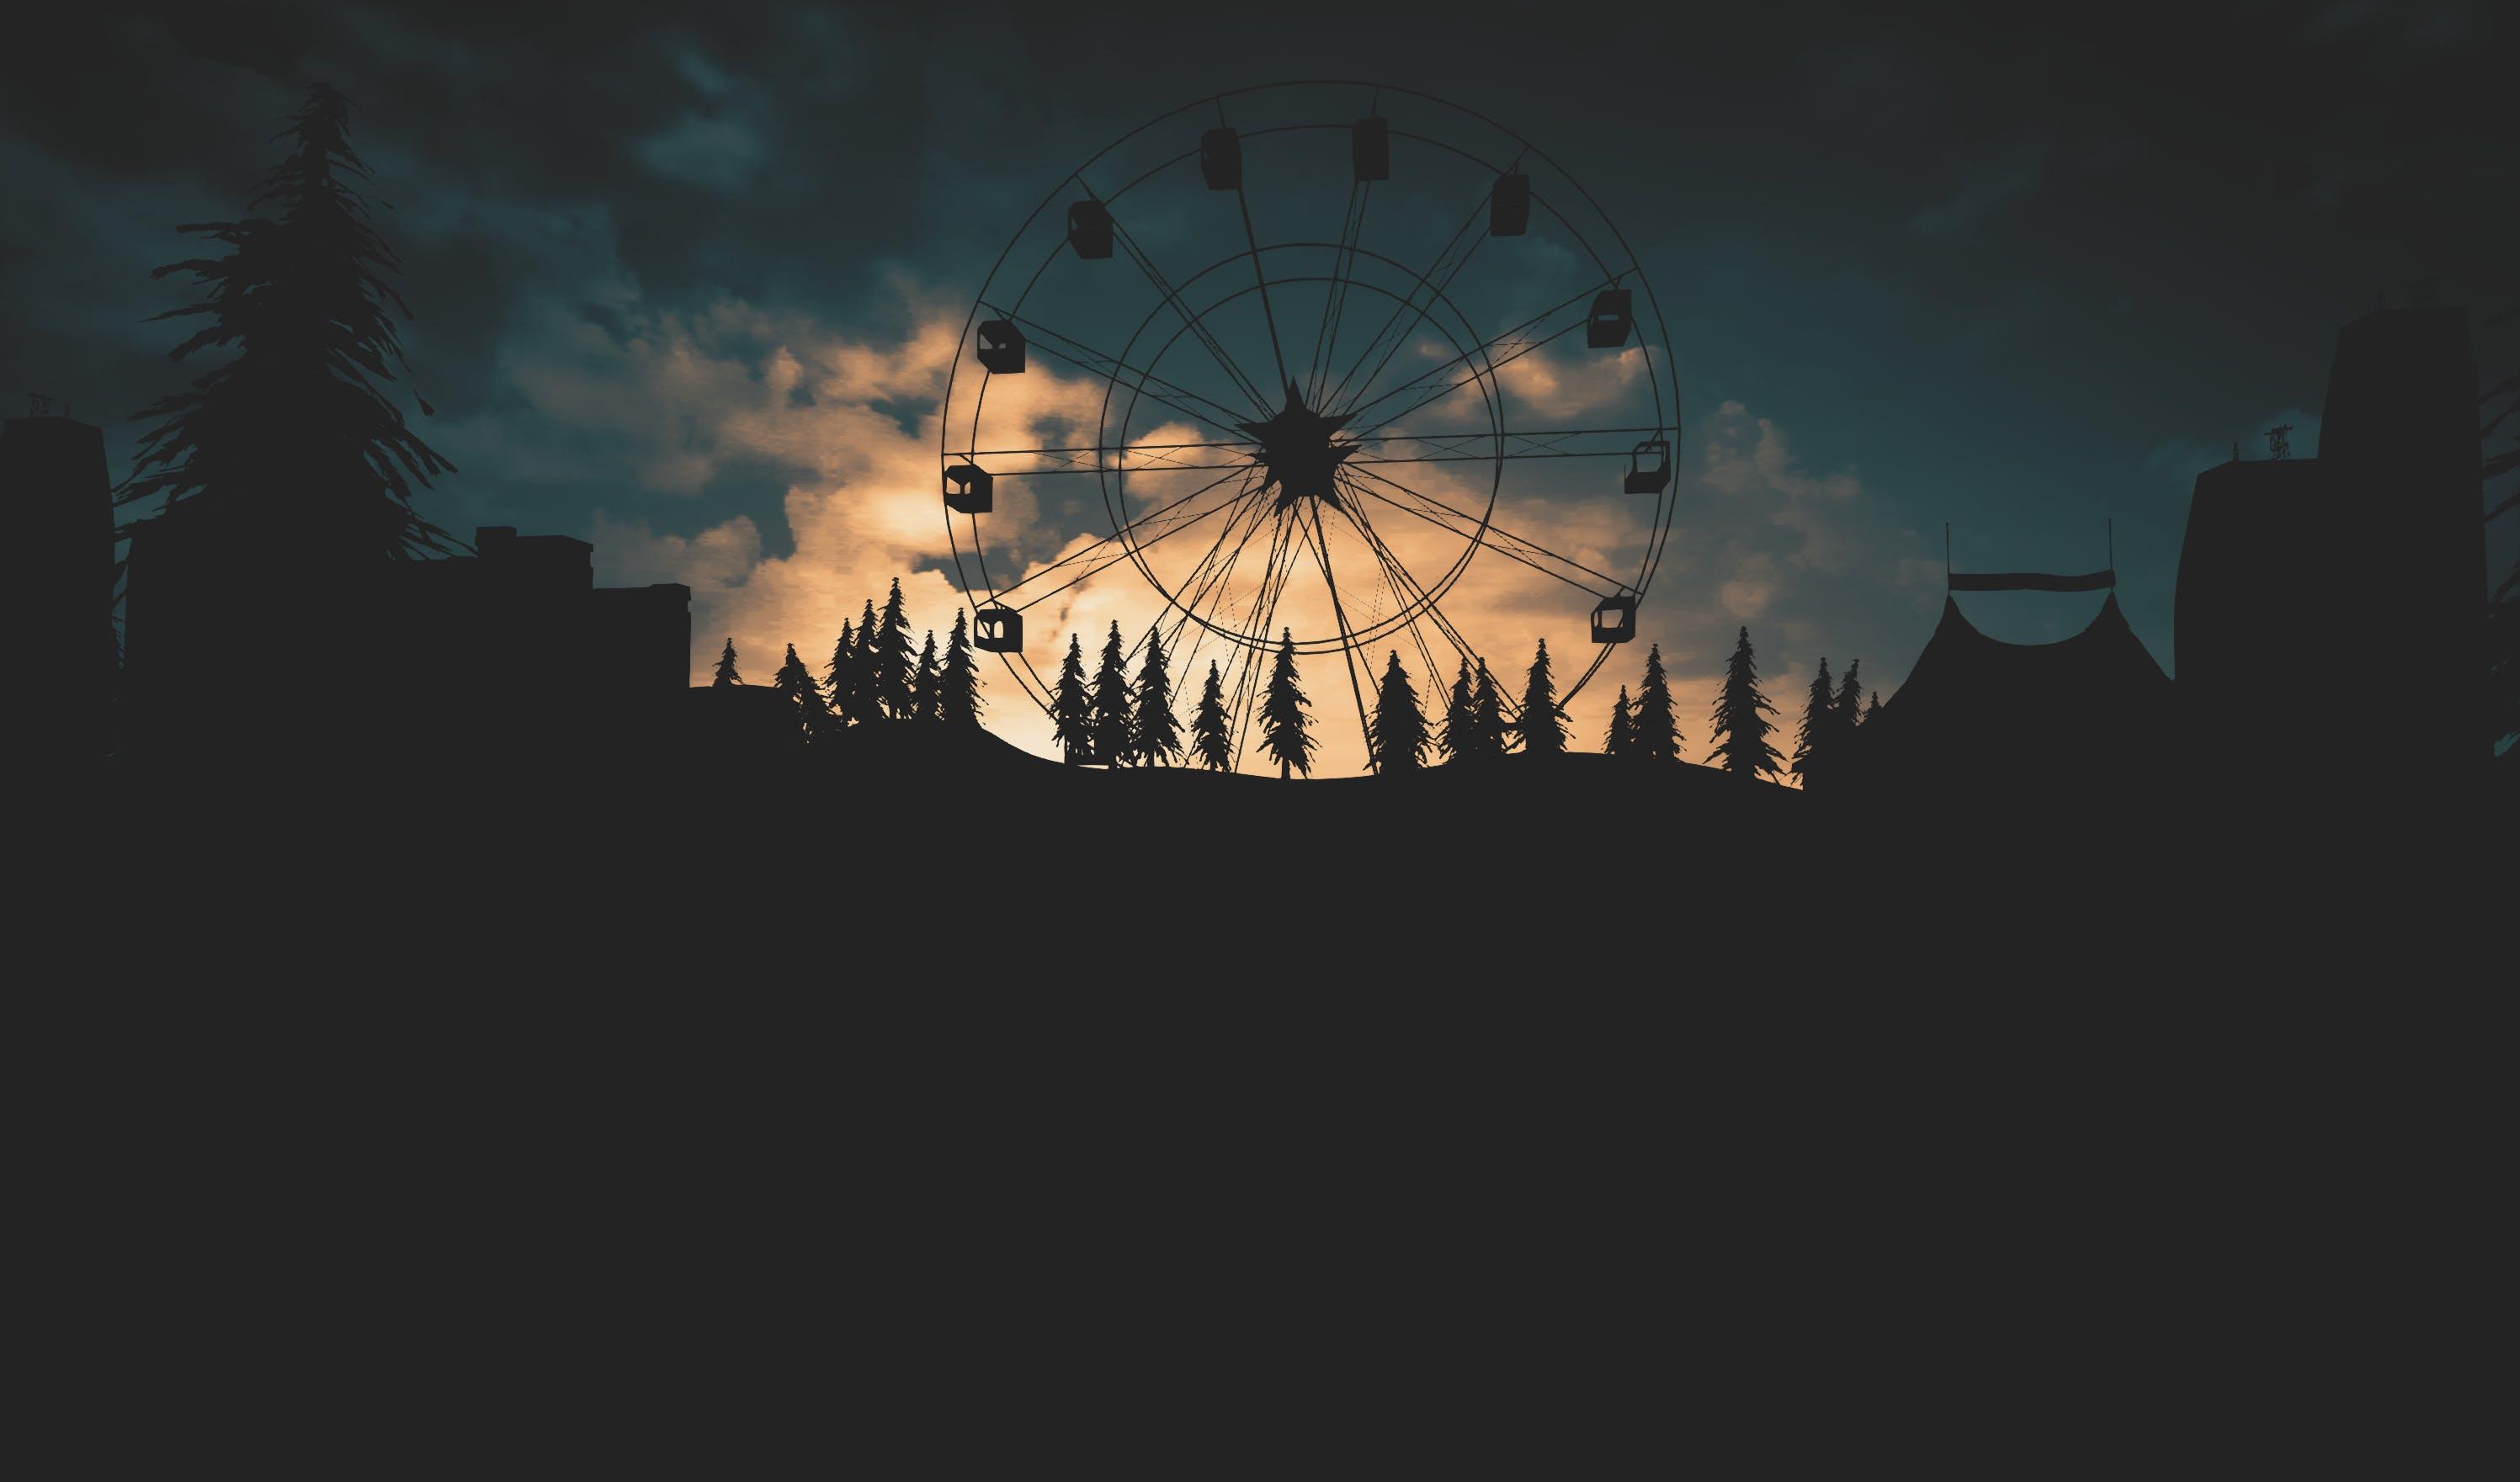 Free stock photo of amusement park, buildings, carousel, circus